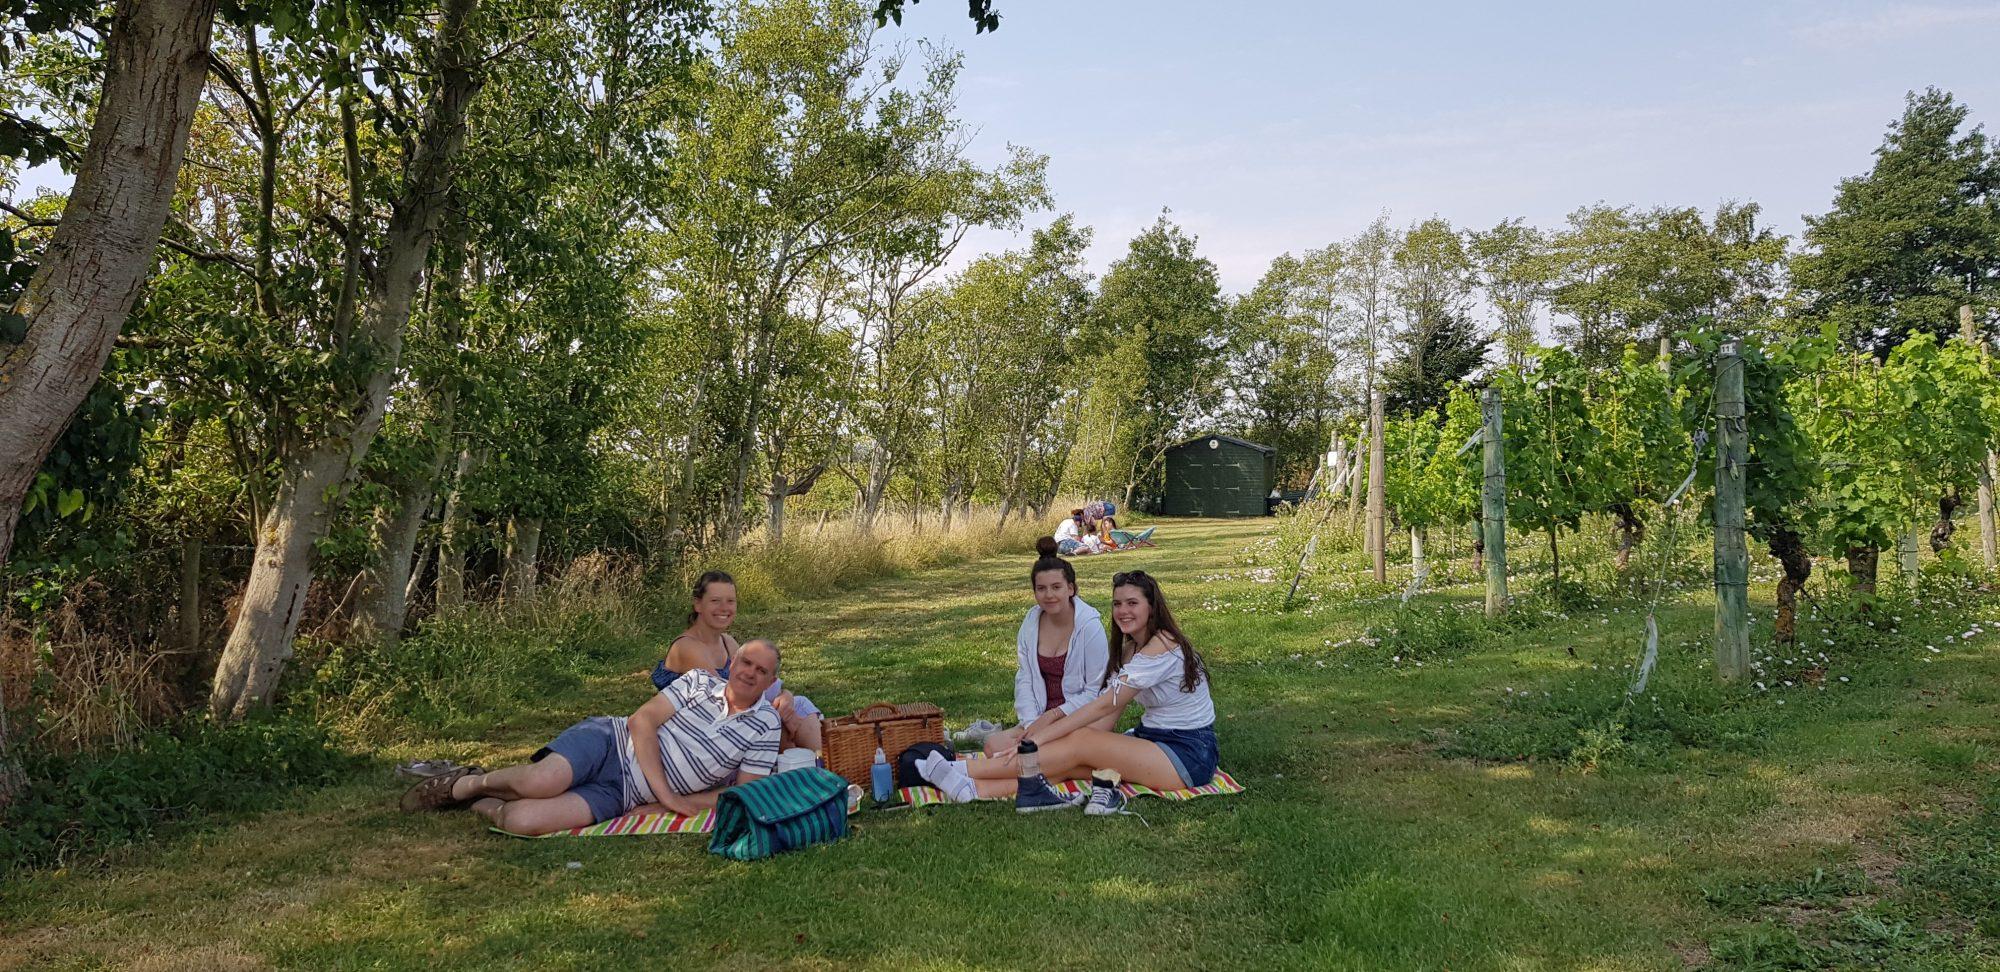 People enjoying a picnic at Warden Abbey Vineyard